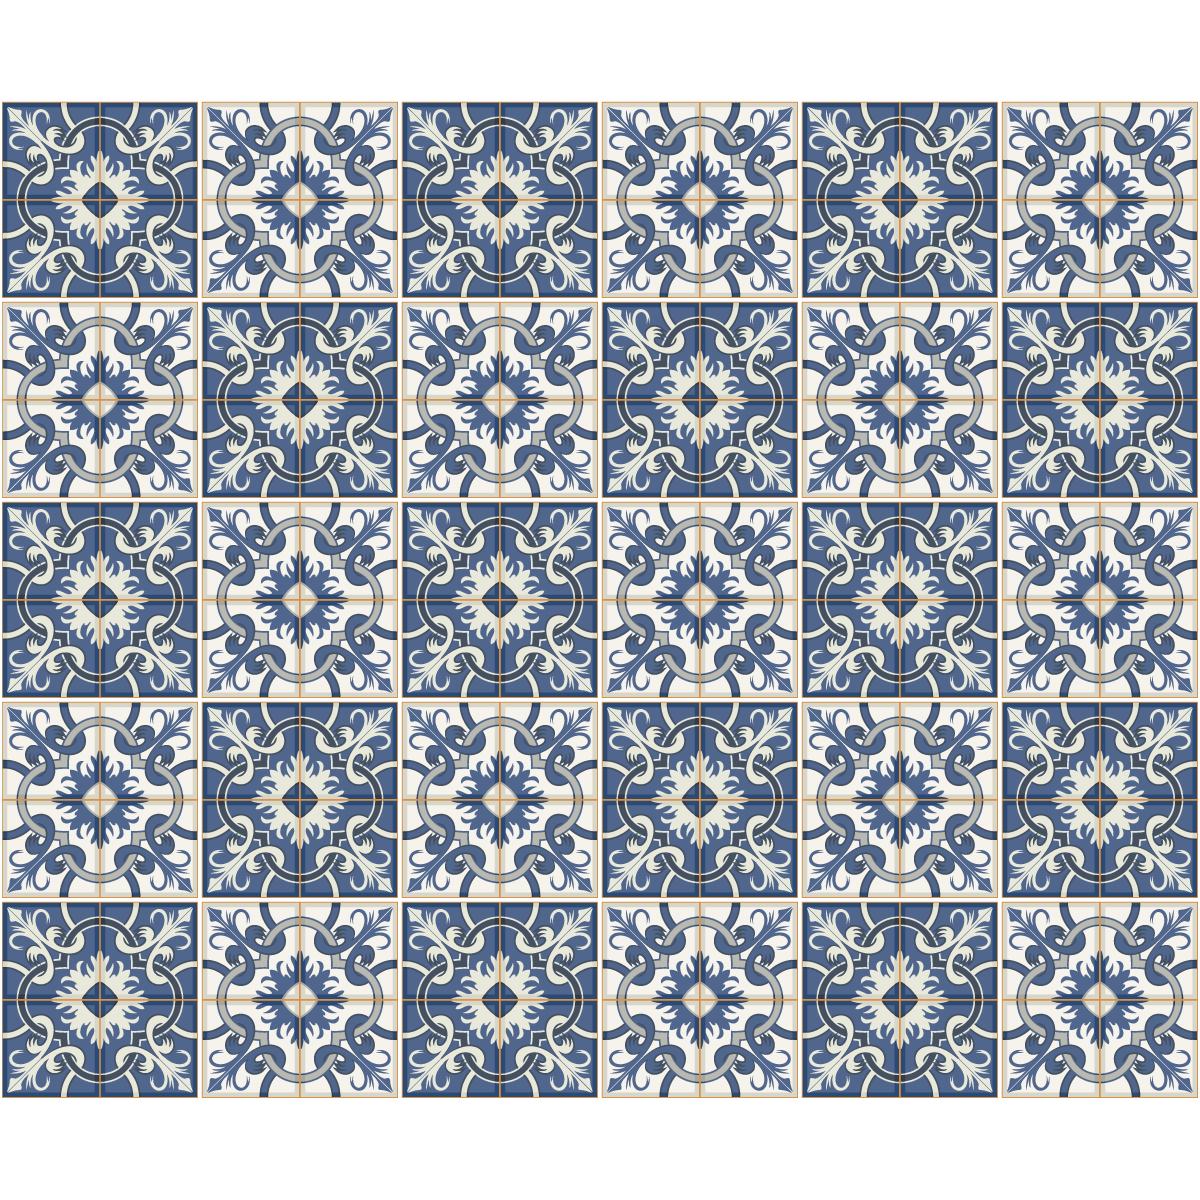 30 stickers carrelages azulejos valentino salle de bain et wc salle de bain ambiance sticker. Black Bedroom Furniture Sets. Home Design Ideas